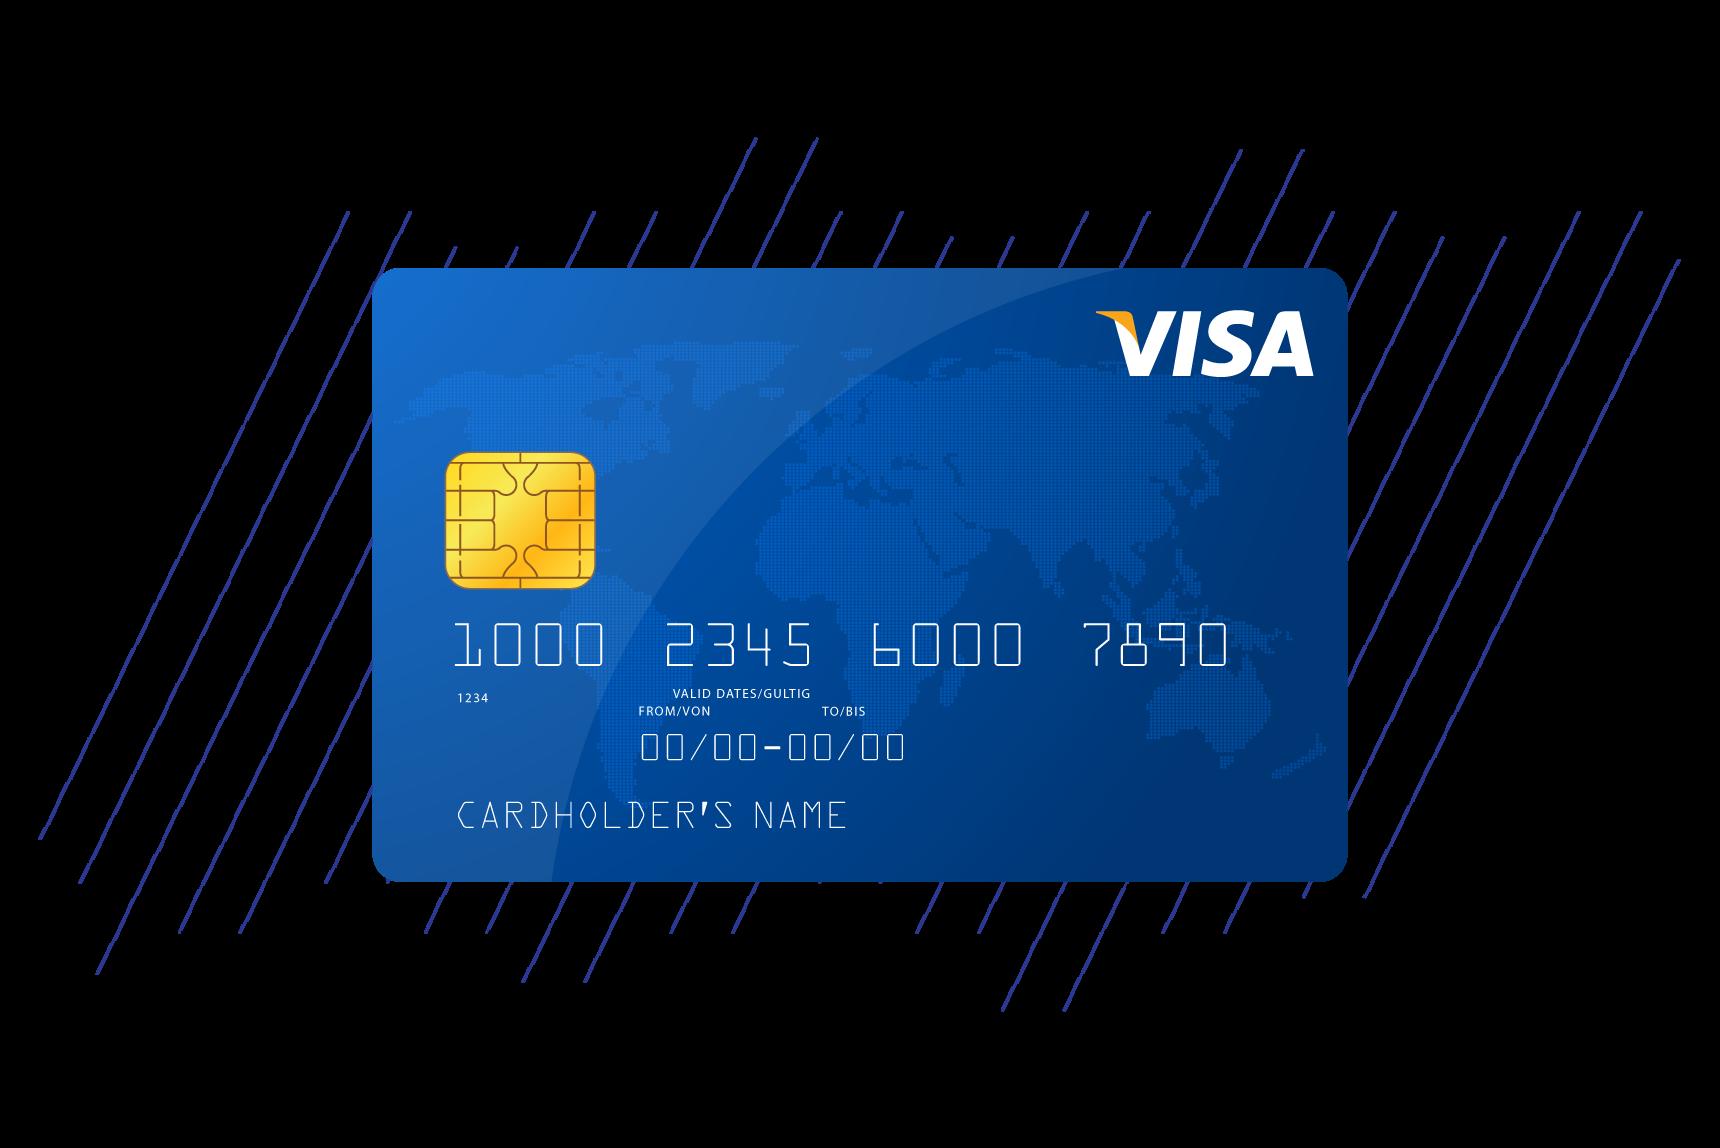 Visa Market Research Case Study